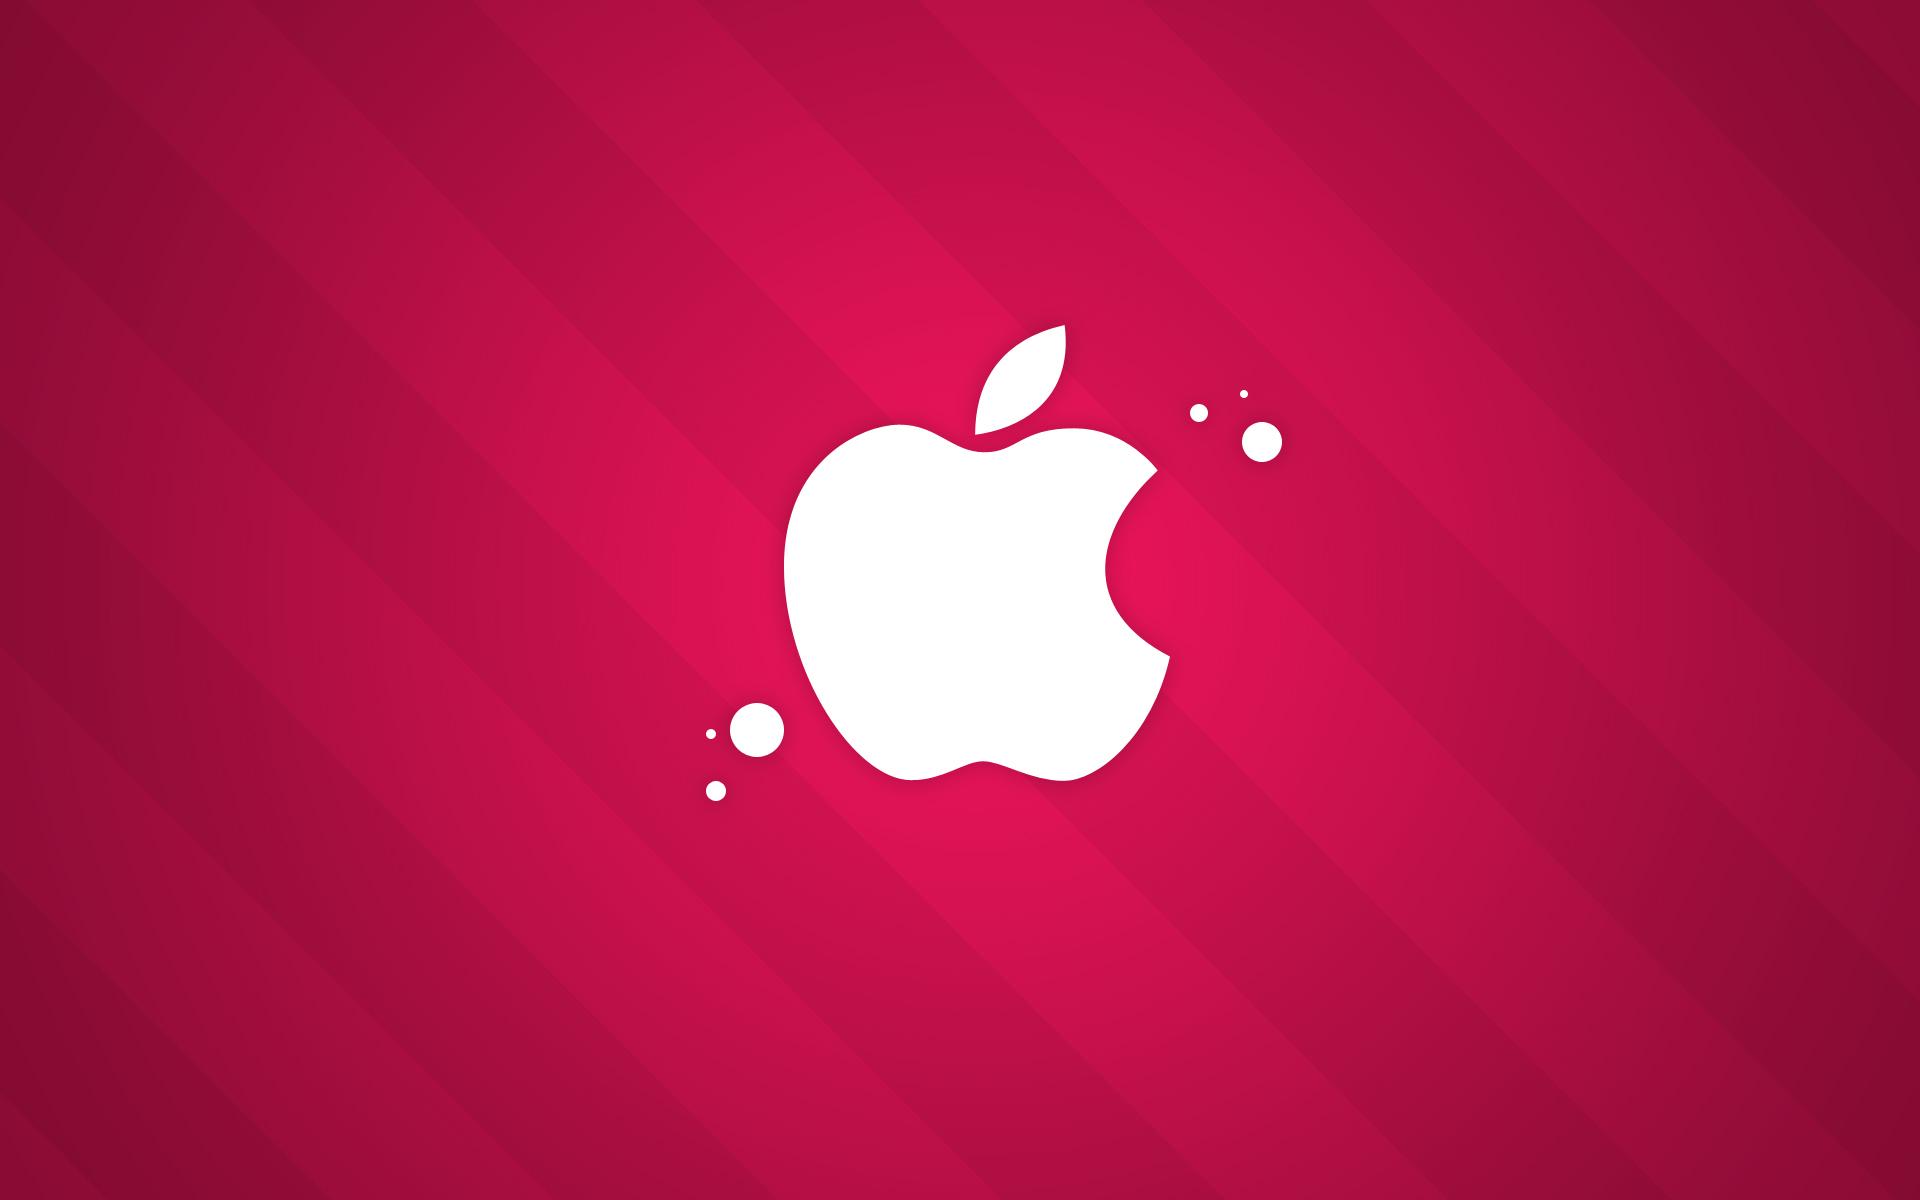 Apple wallpaper 2880x1920